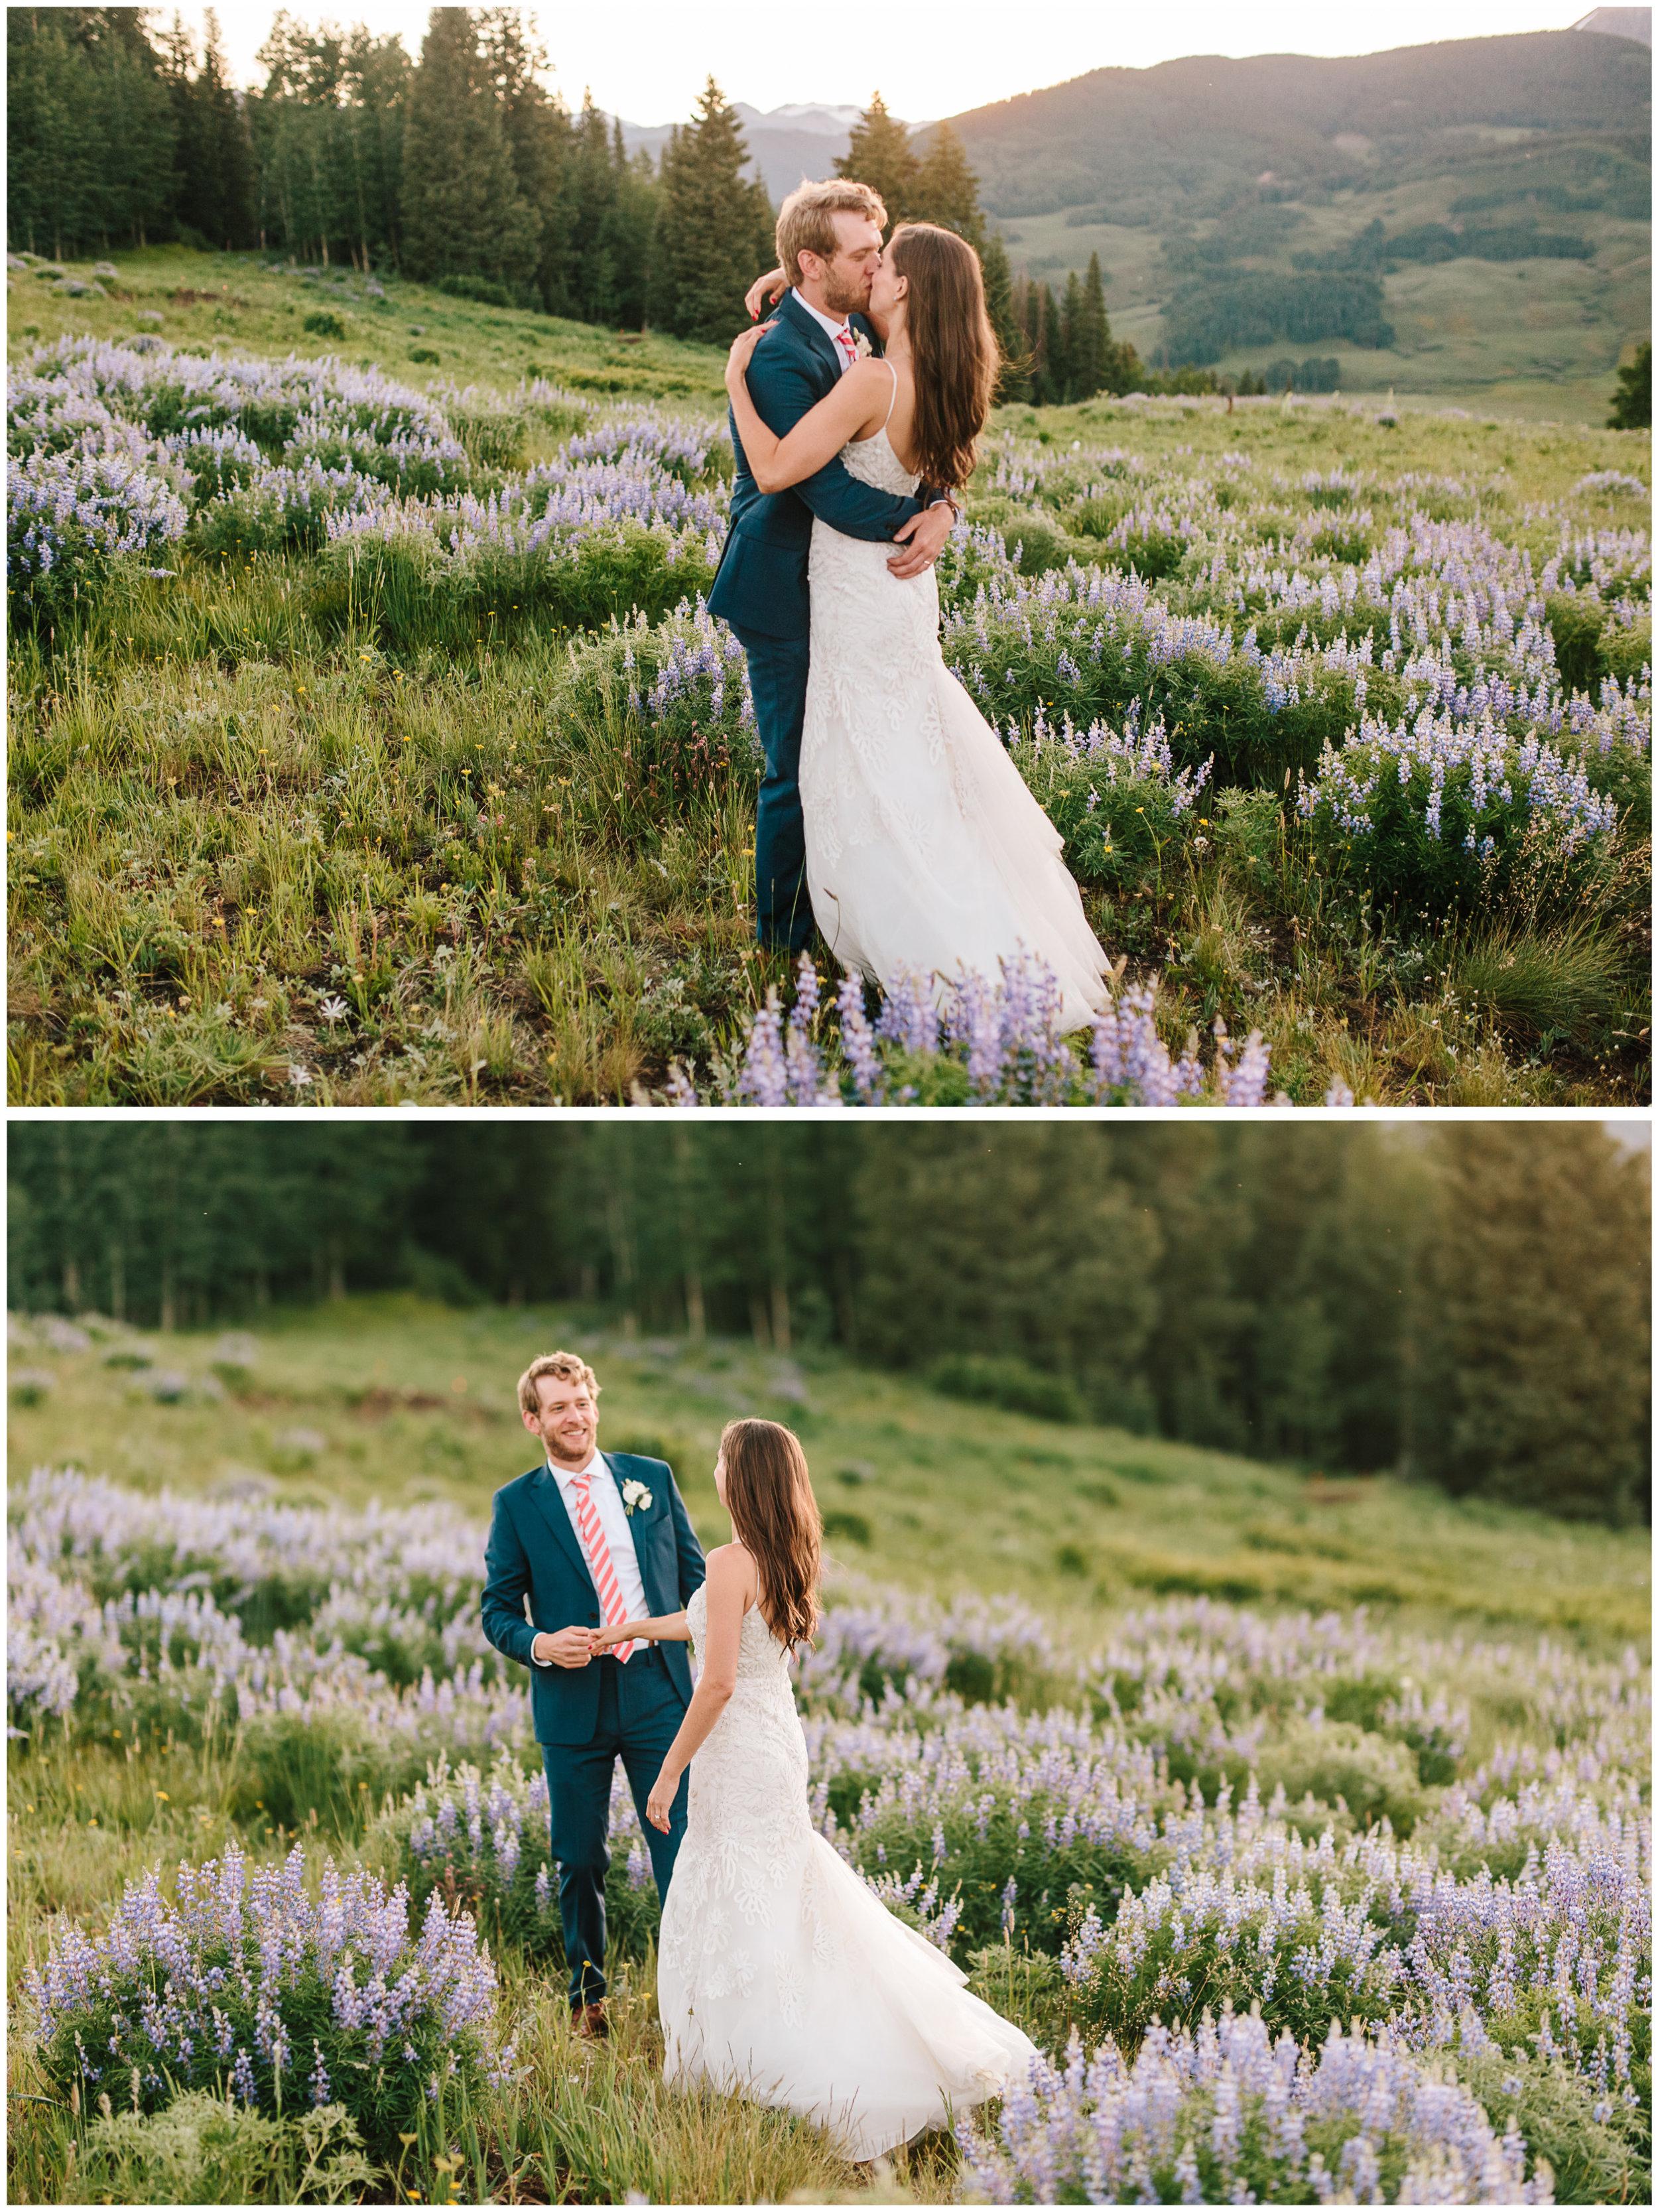 crested_butte_wedding_63.jpg